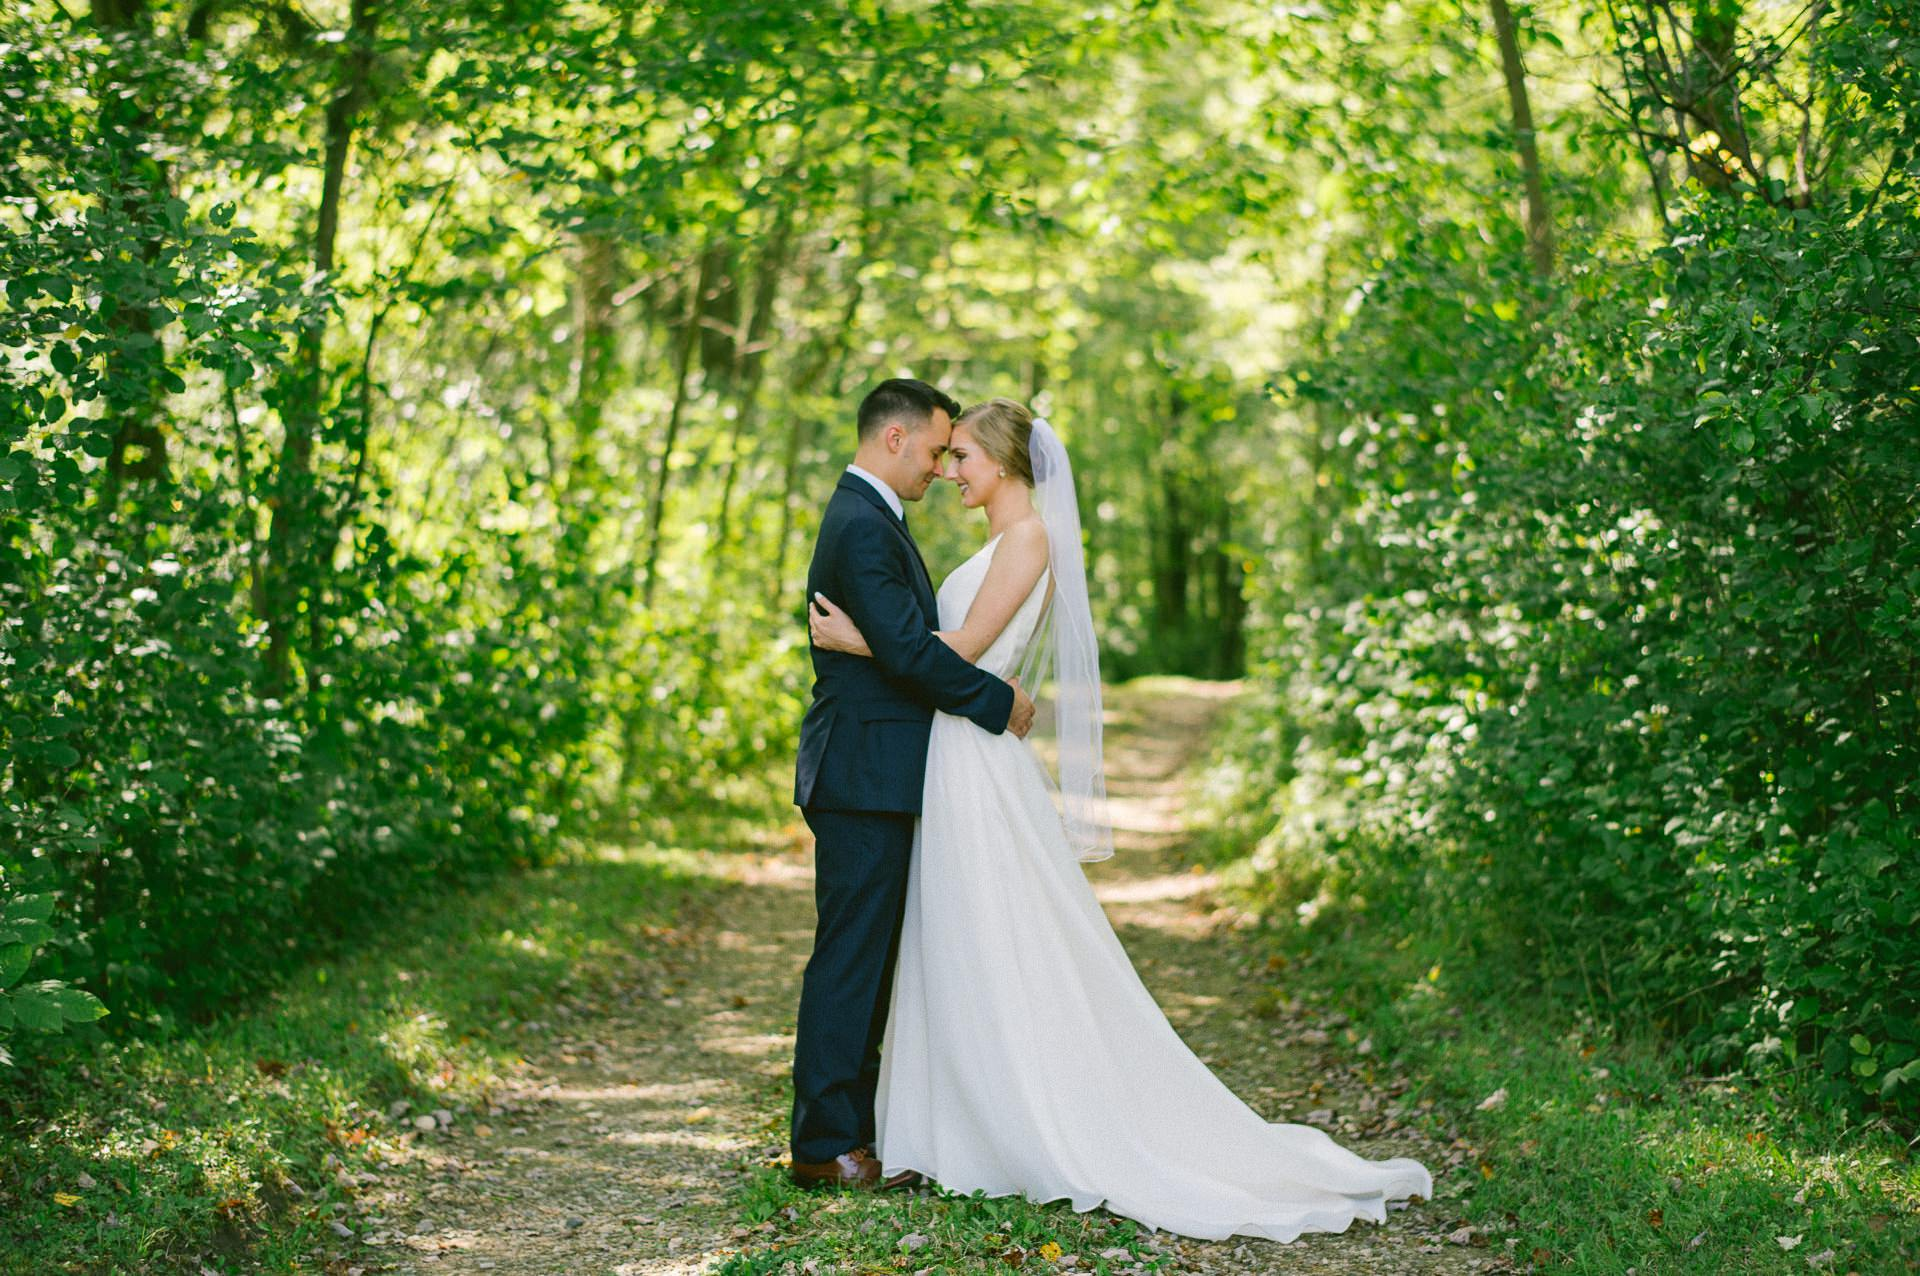 Bertram Inn Wedding Photographer in Aurora 1 25.jpg